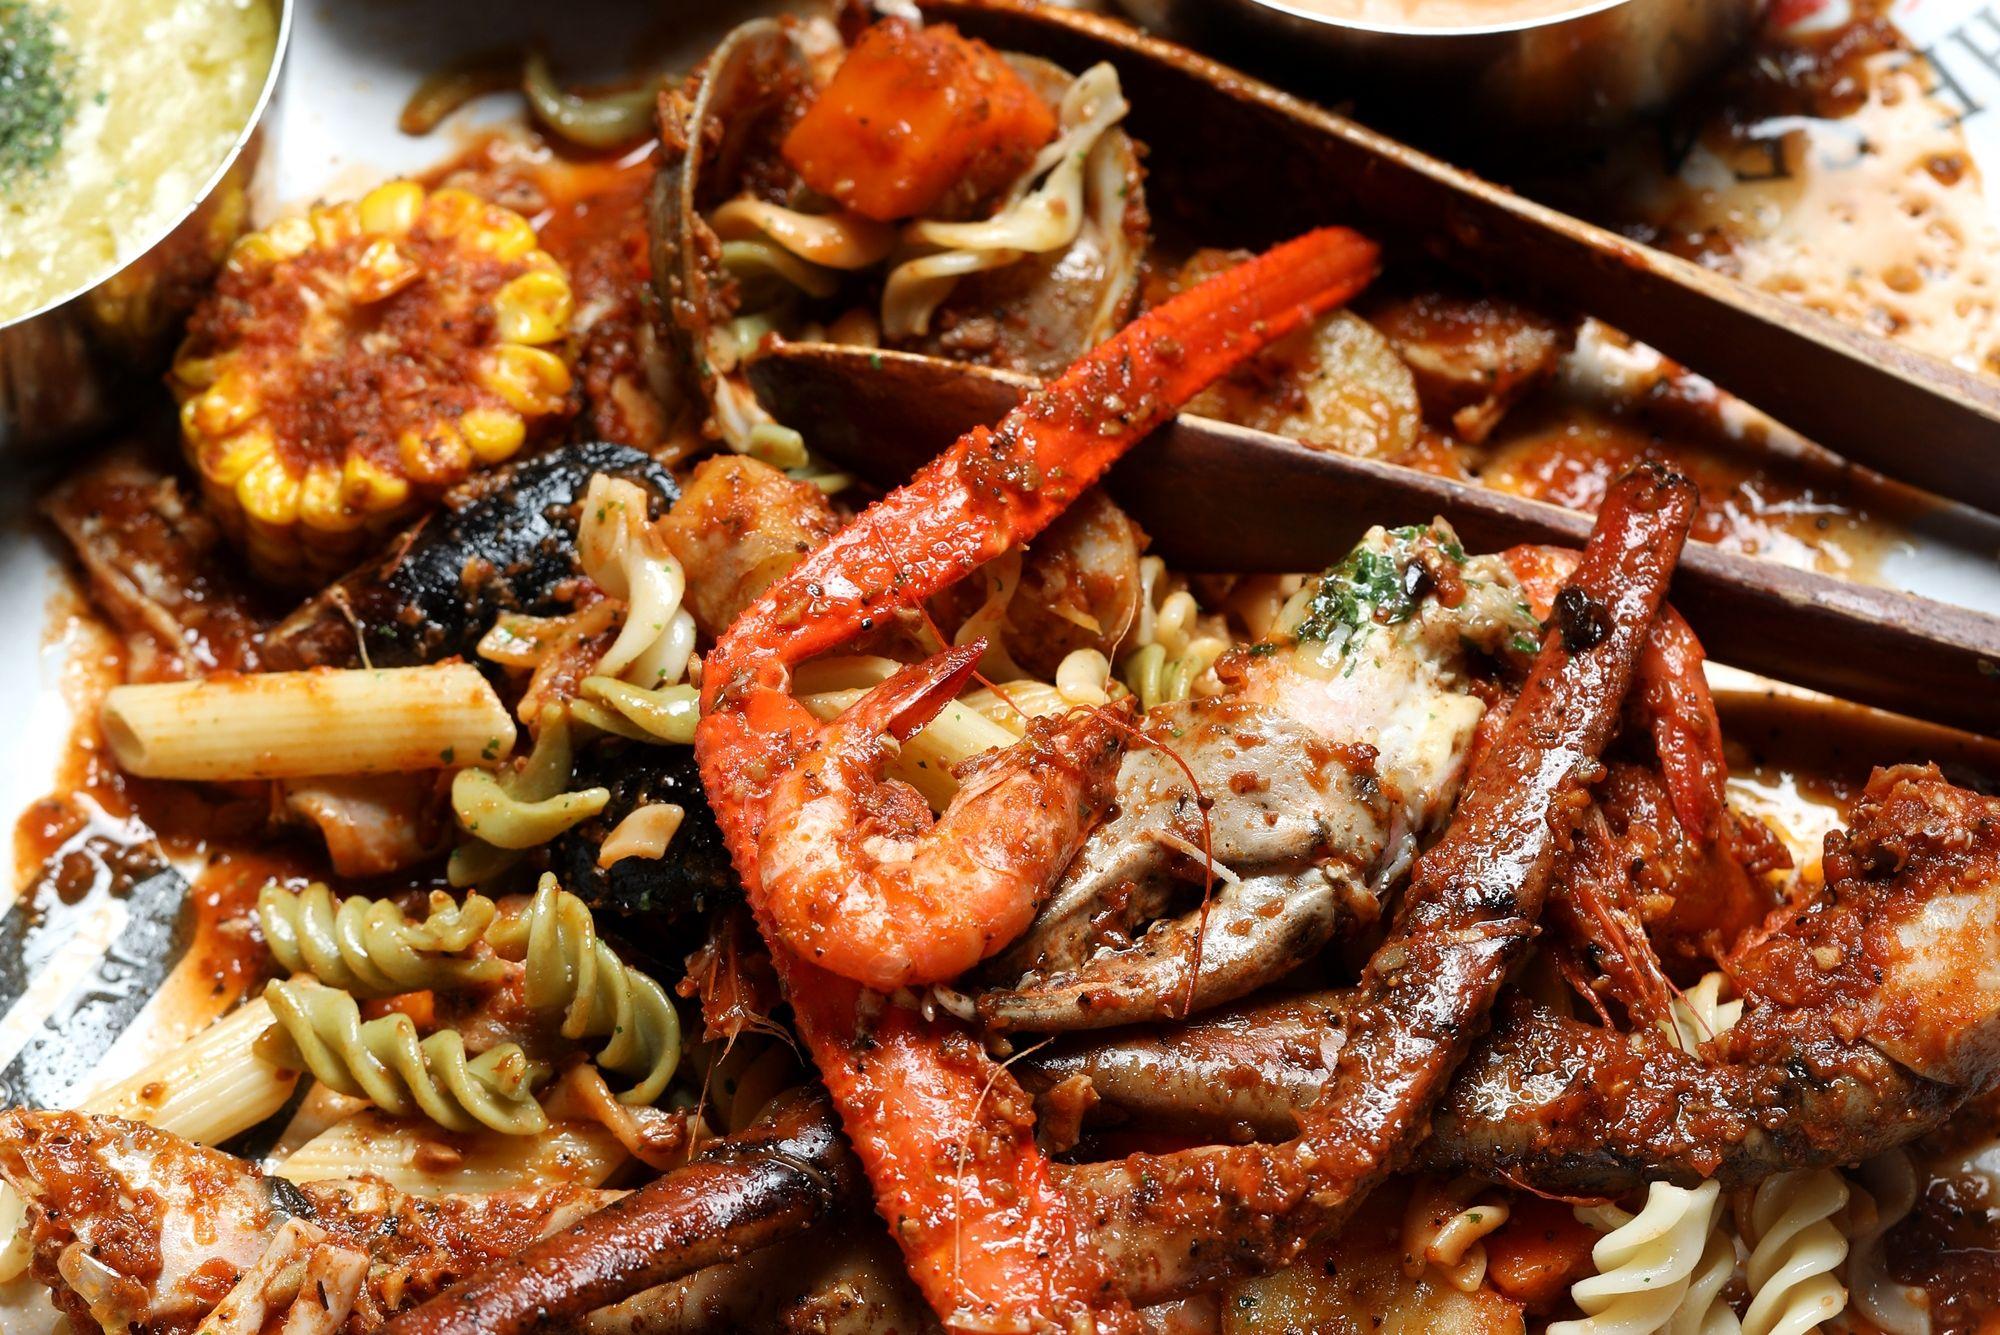 微風南山,手抓海鮮,新加坡,Dancing Crab,蟹舞,海鮮